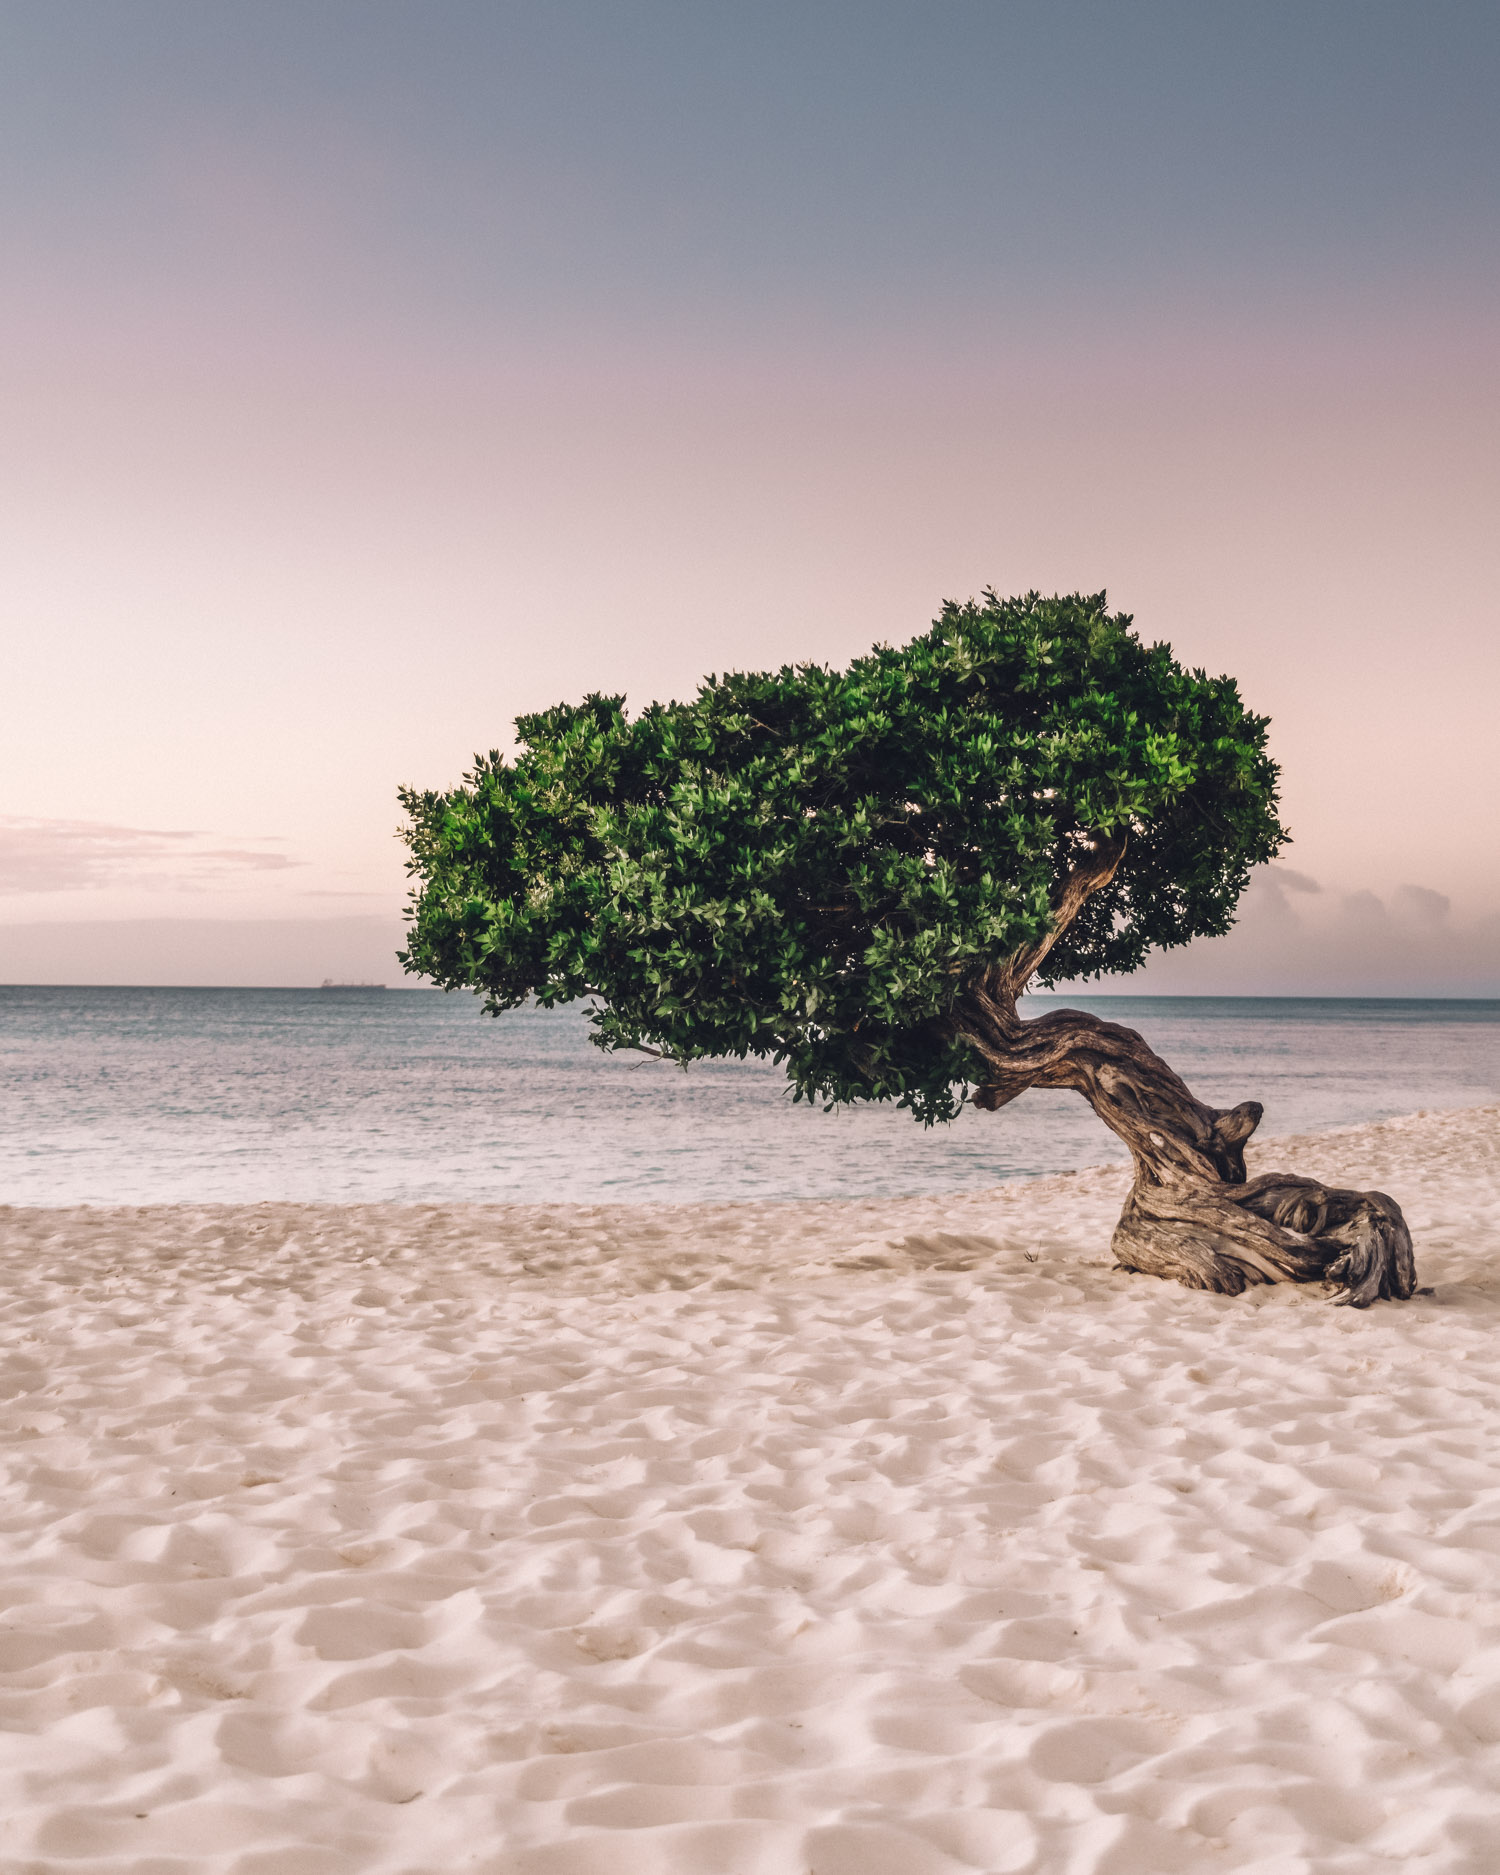 The Ultimate Aruba Travel Guide |Eagle Beach, Sunset, Aruba